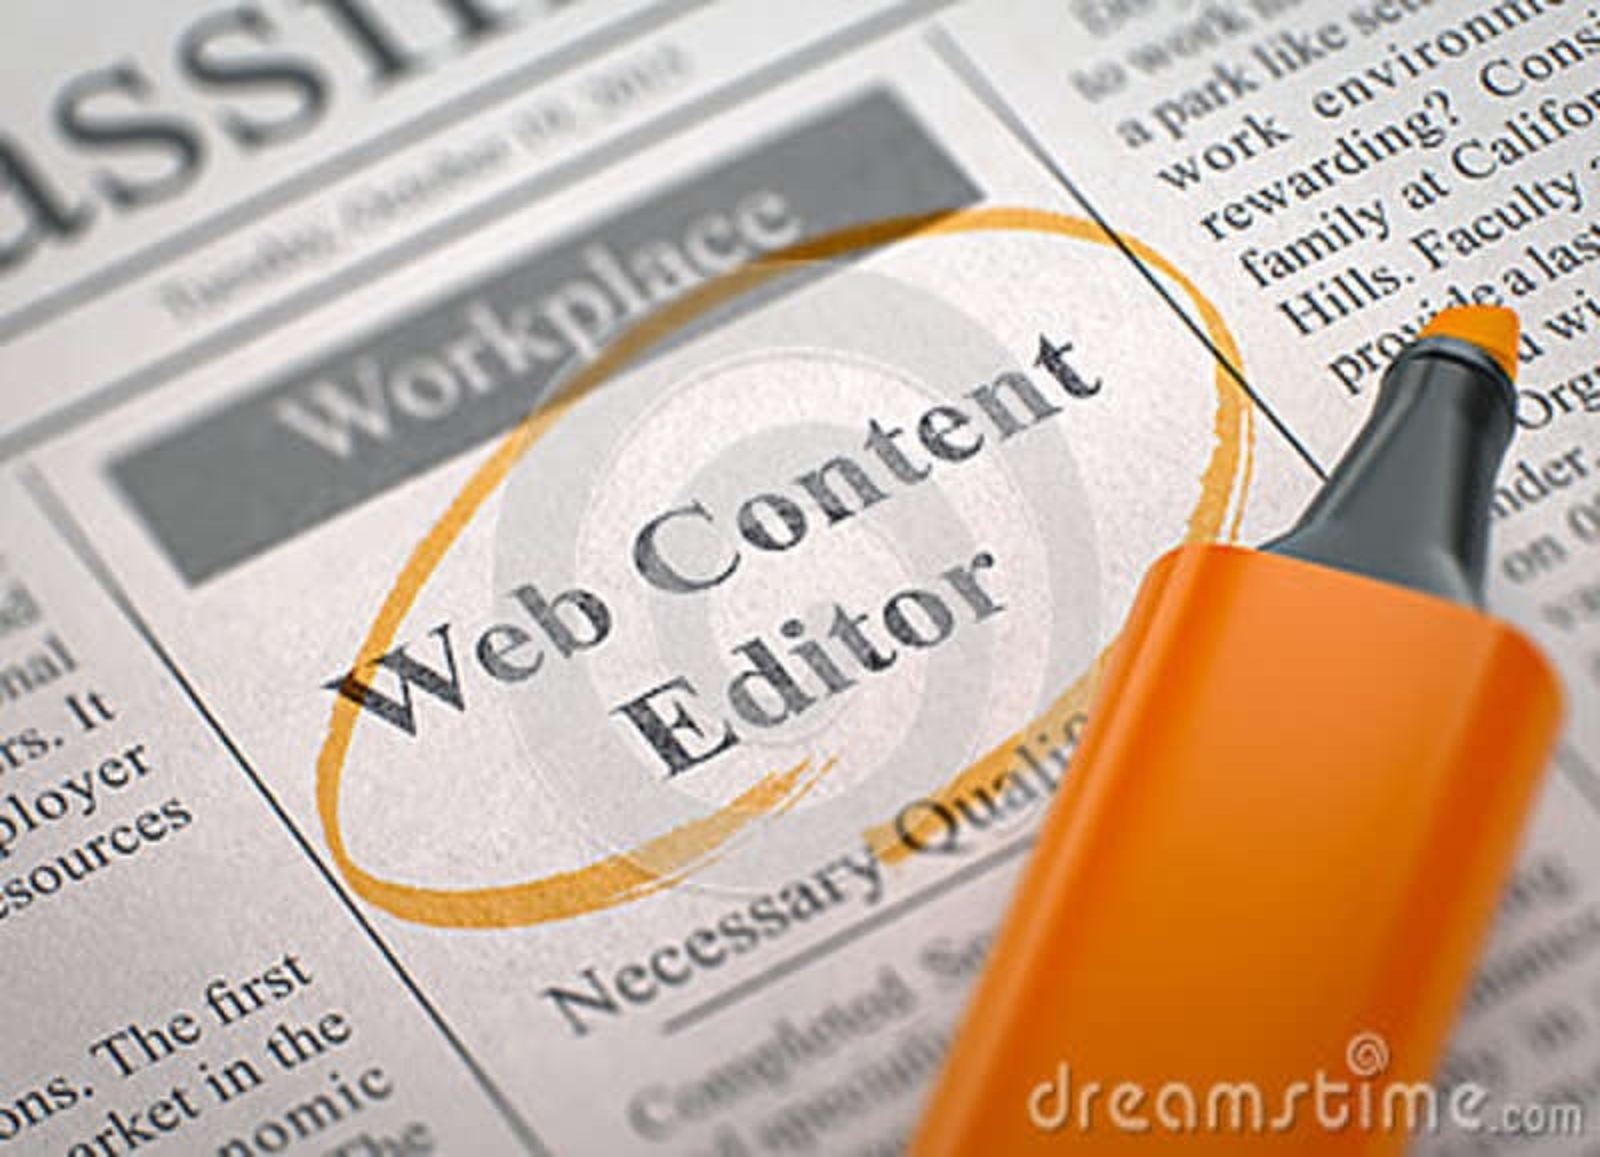 esl thesis statement writer site ca